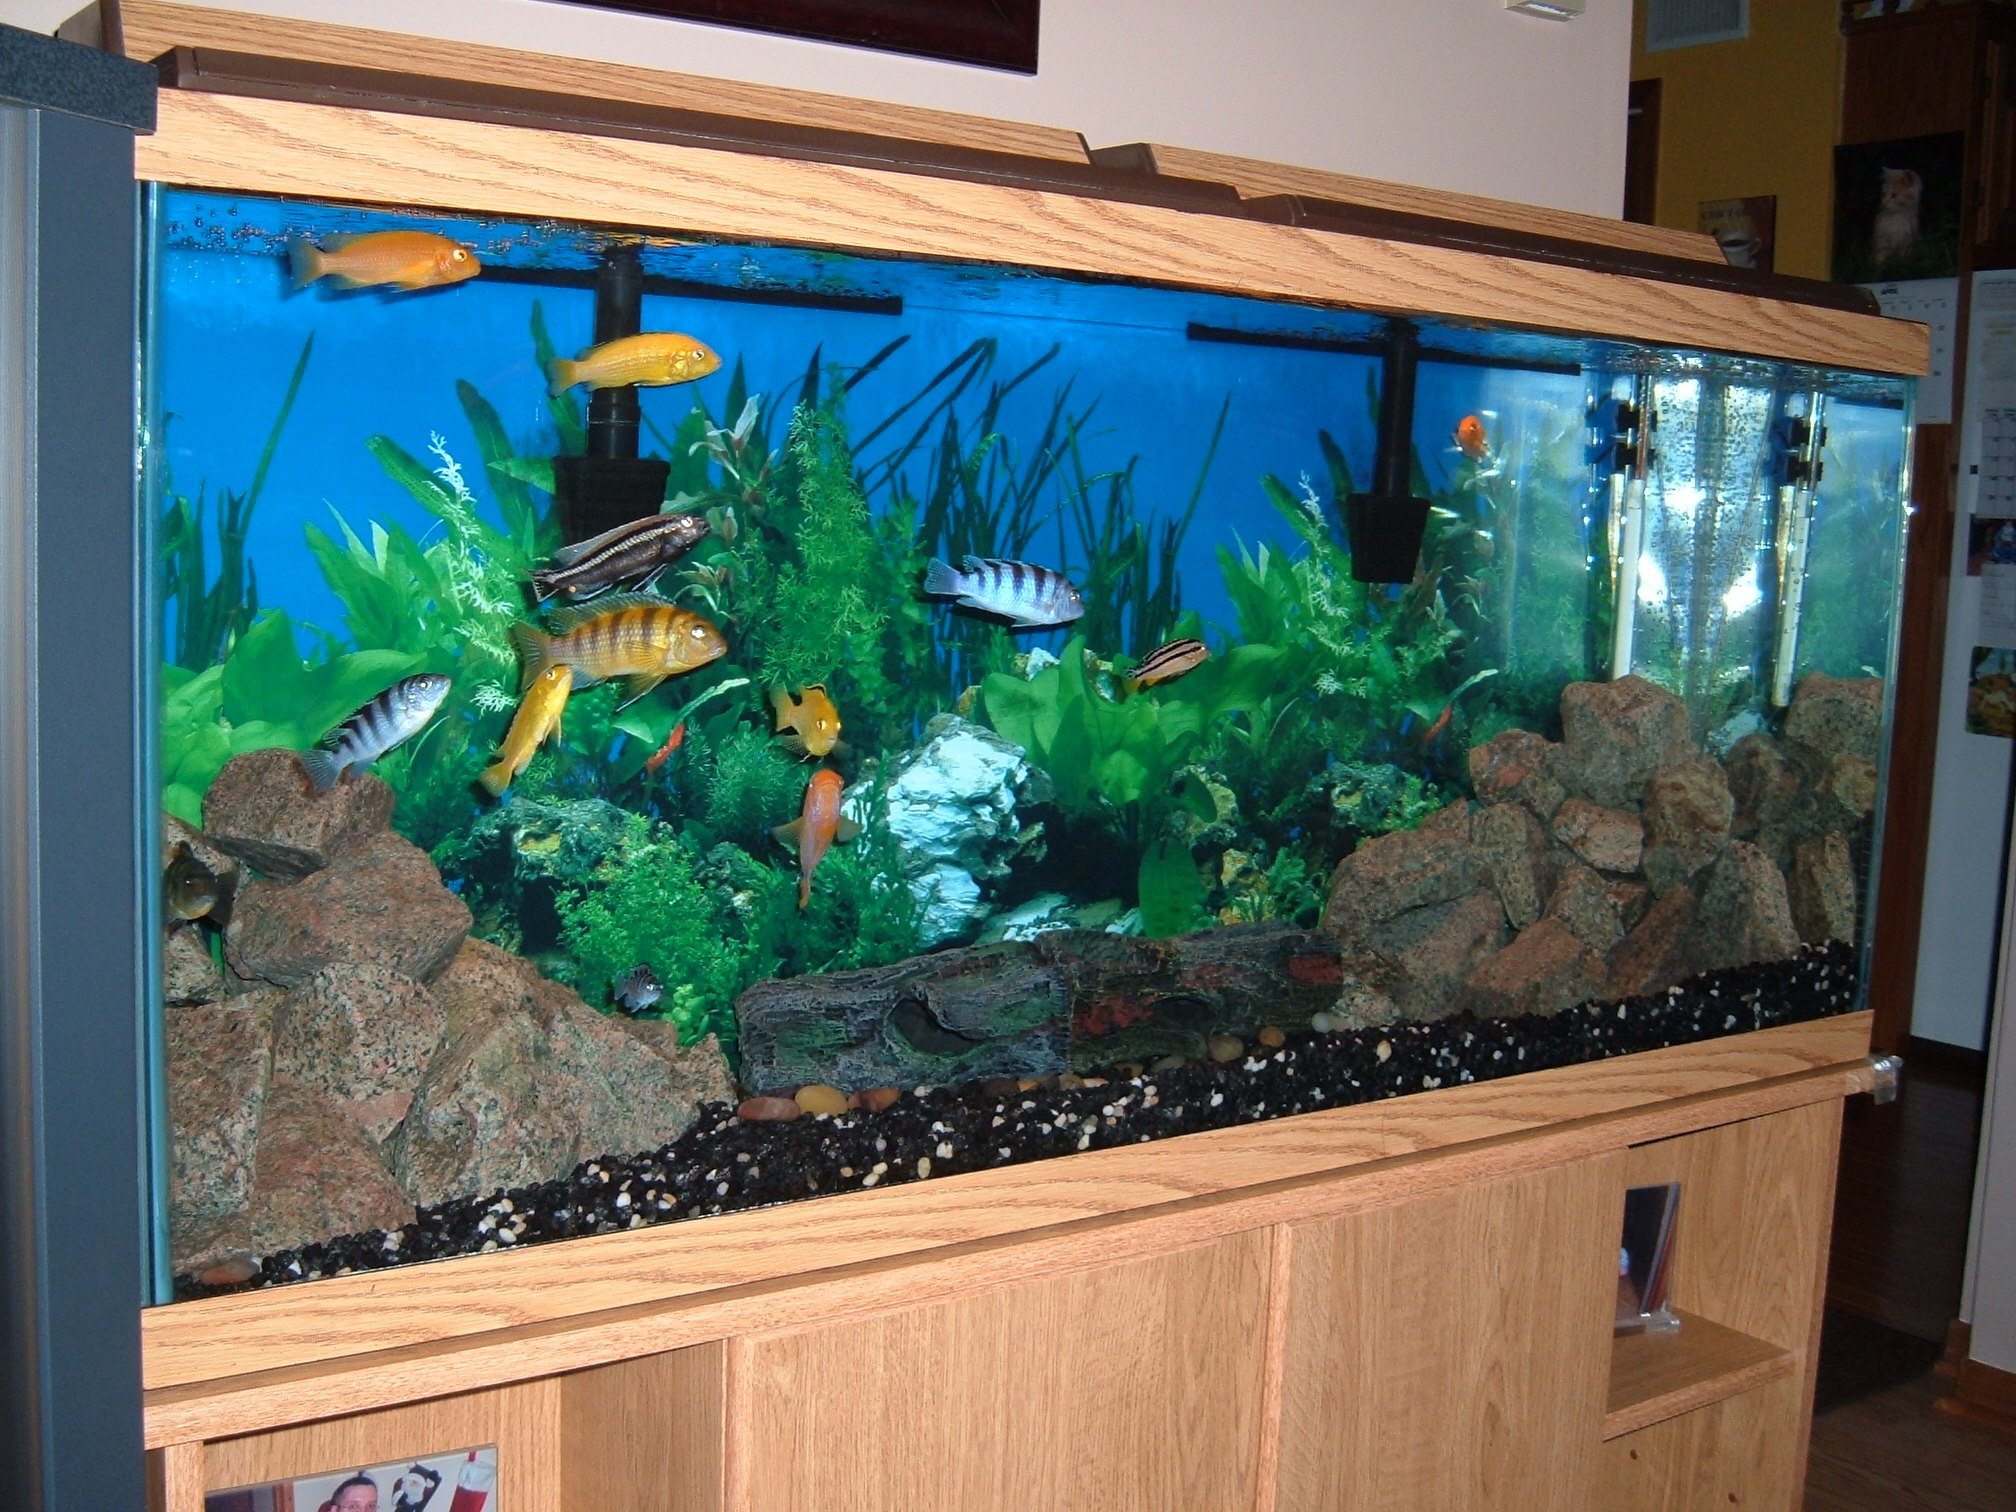 Tank examples 55 gallon mbuna tank remodeled for 200 gallon fish tank dimensions